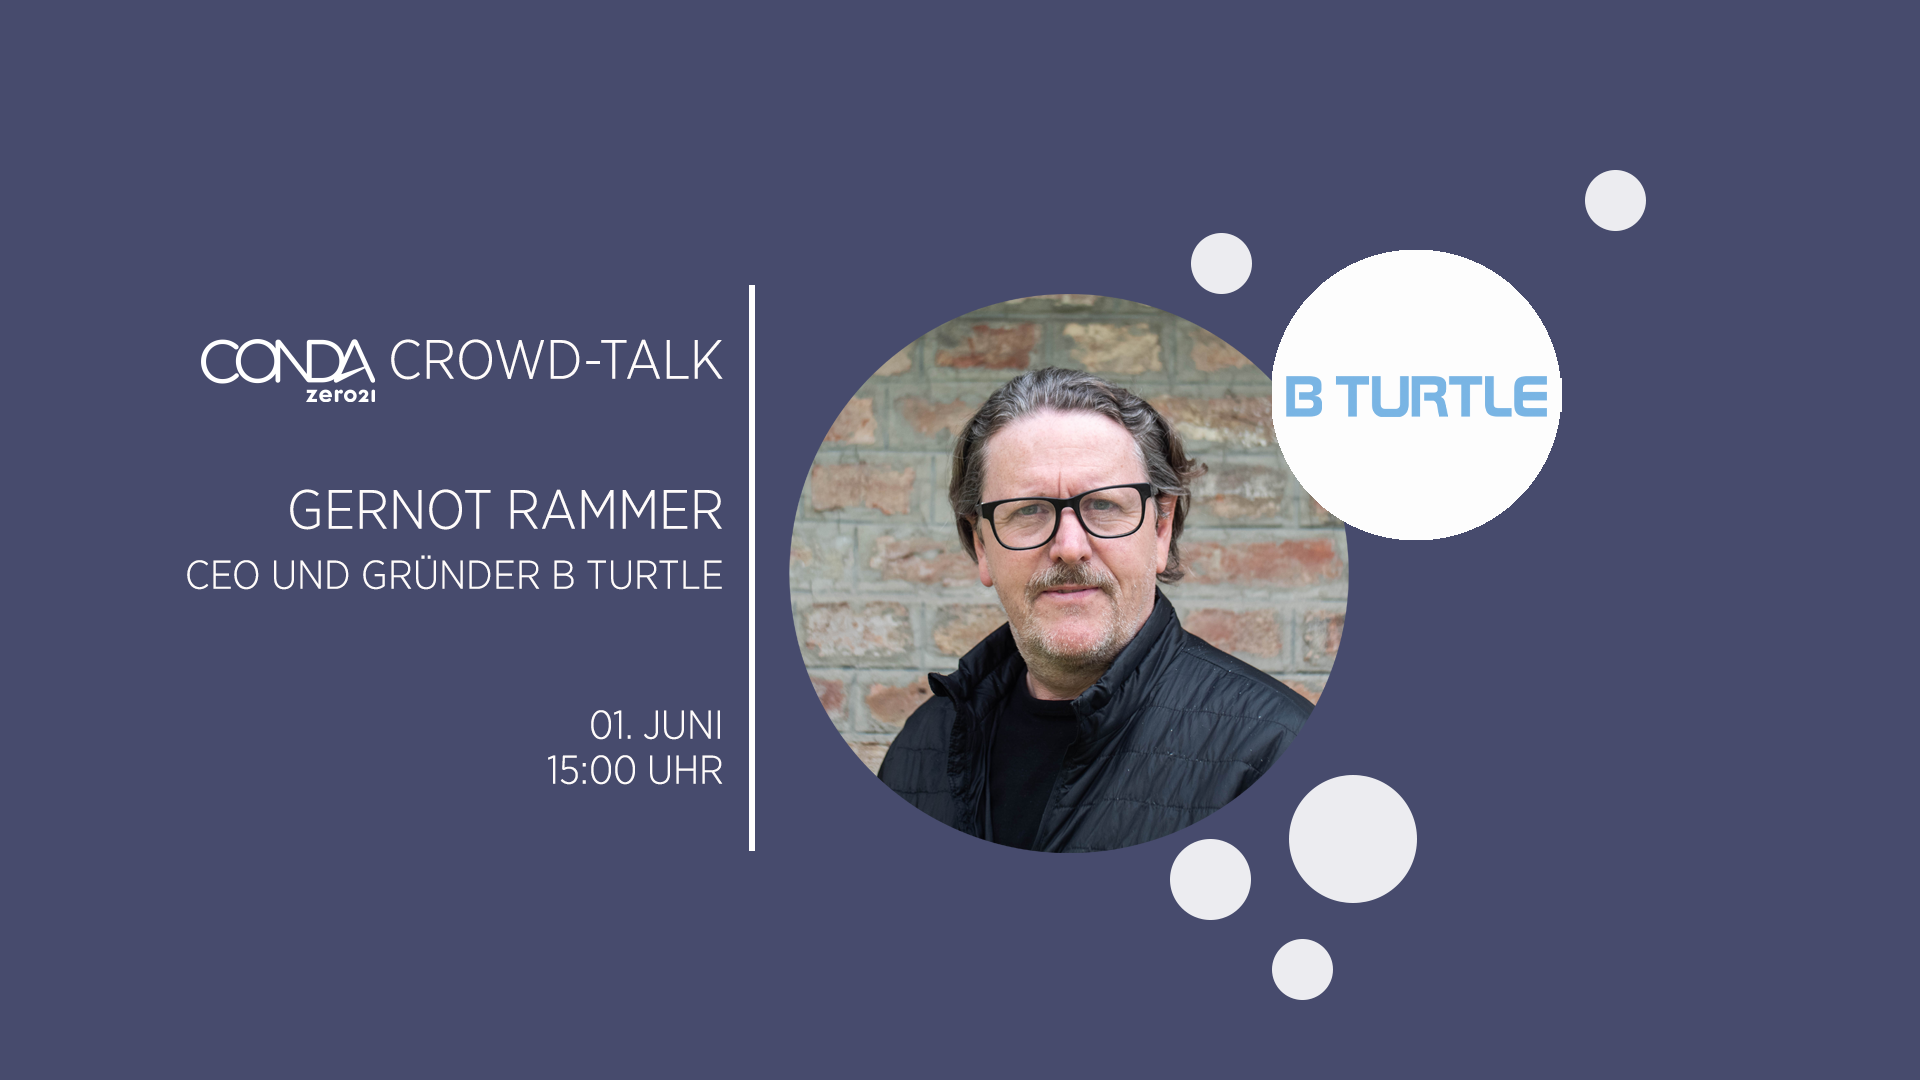 CONDA Crowd Talk B TURTLE Gernot Rammer